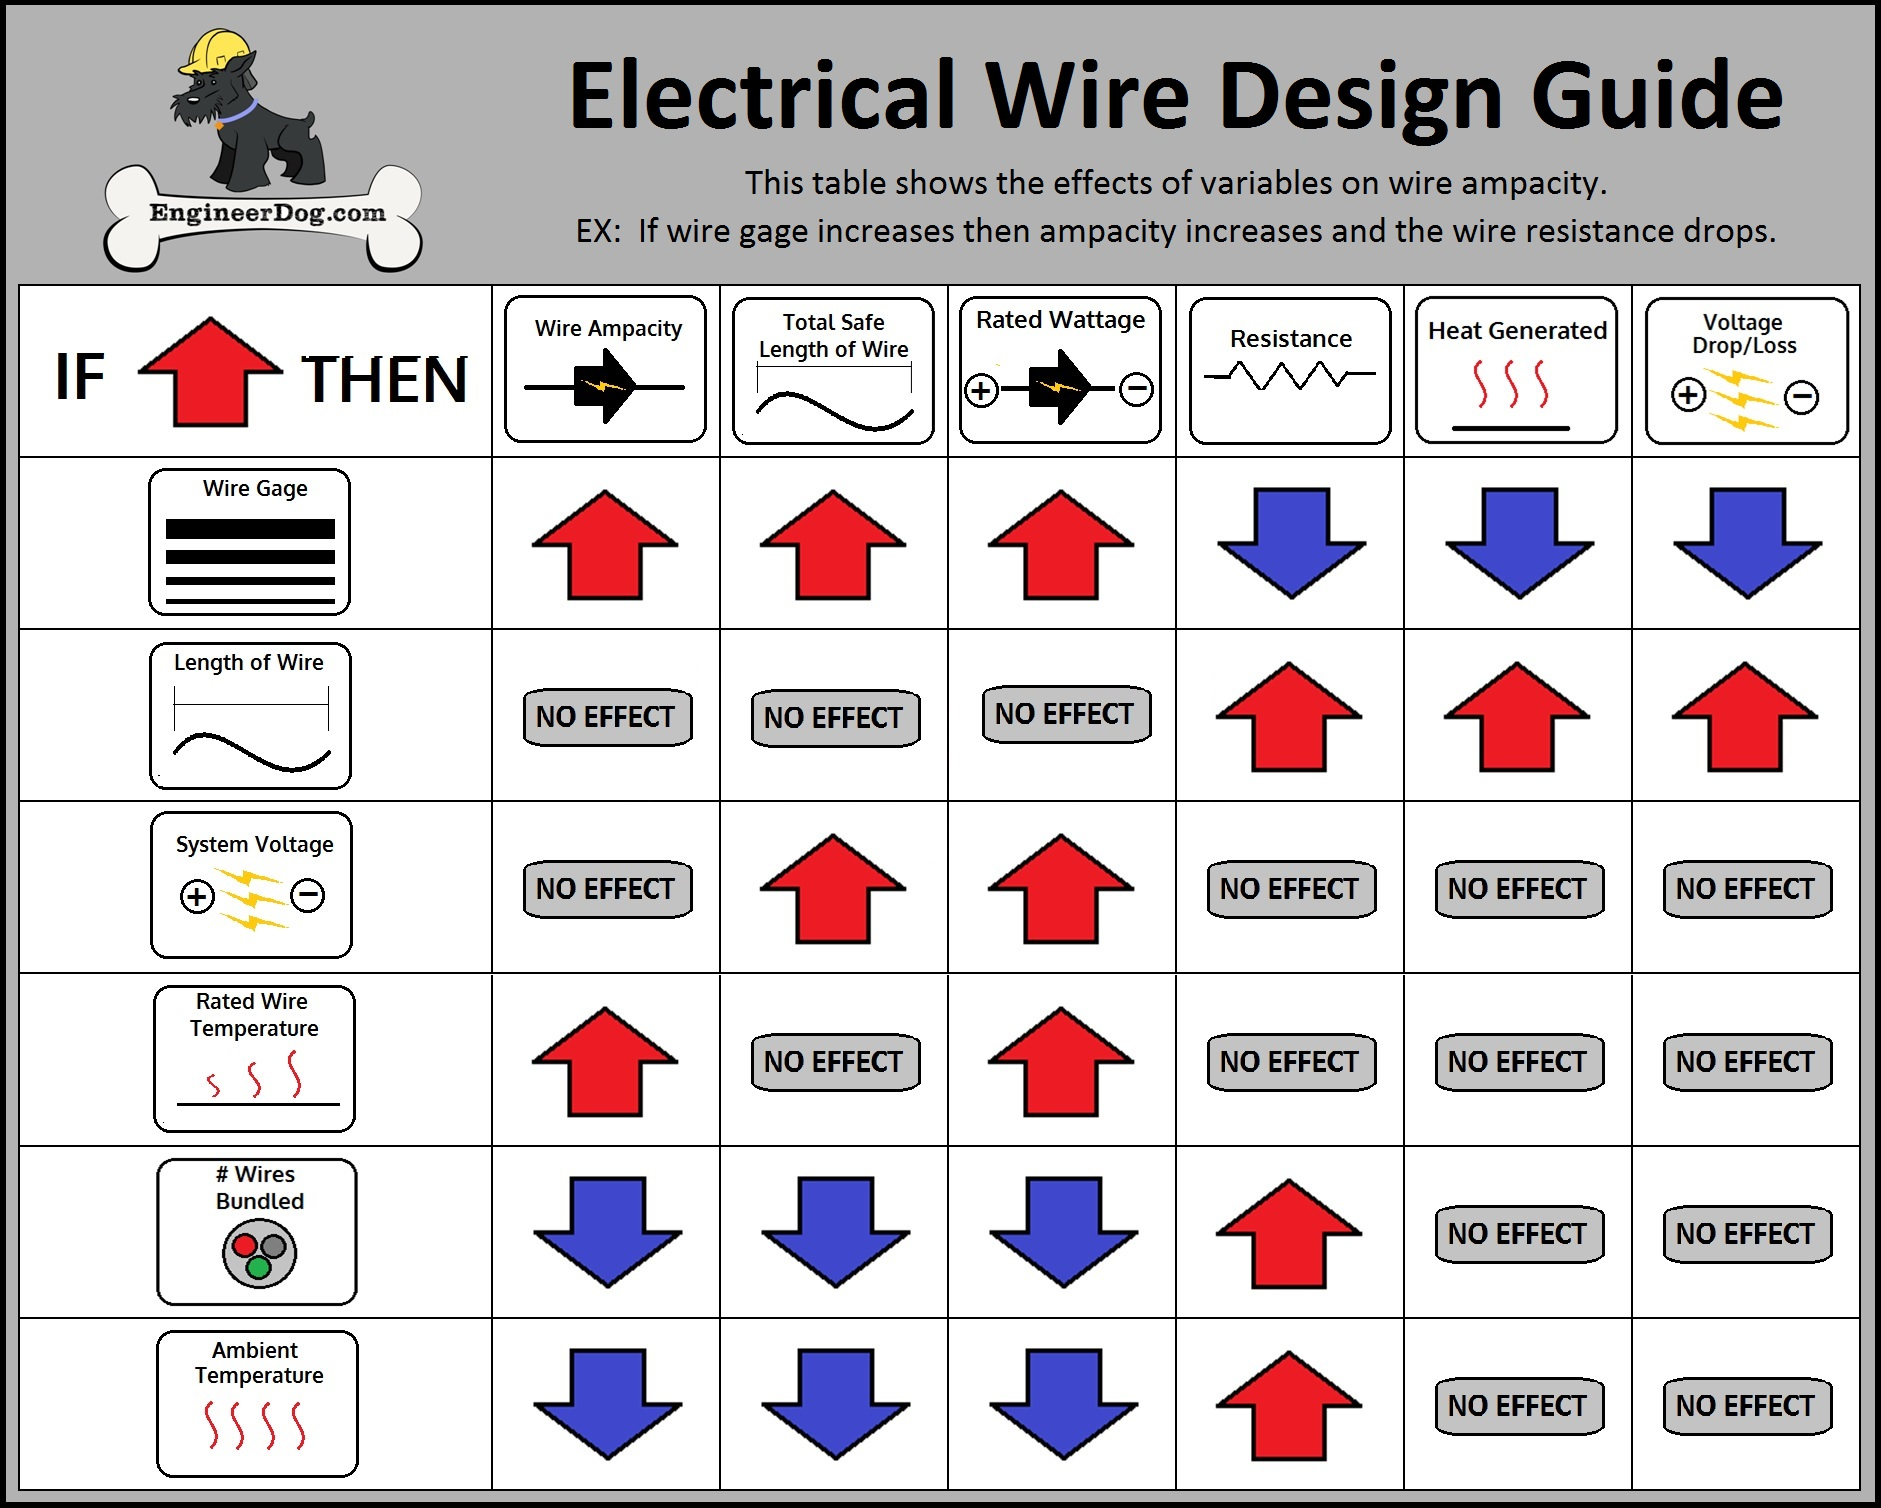 Attractive copper wire gauge sizes gallery wiring diagram ideas beautiful craft wire gauge chart crest wiring diagram ideas greentooth Choice Image